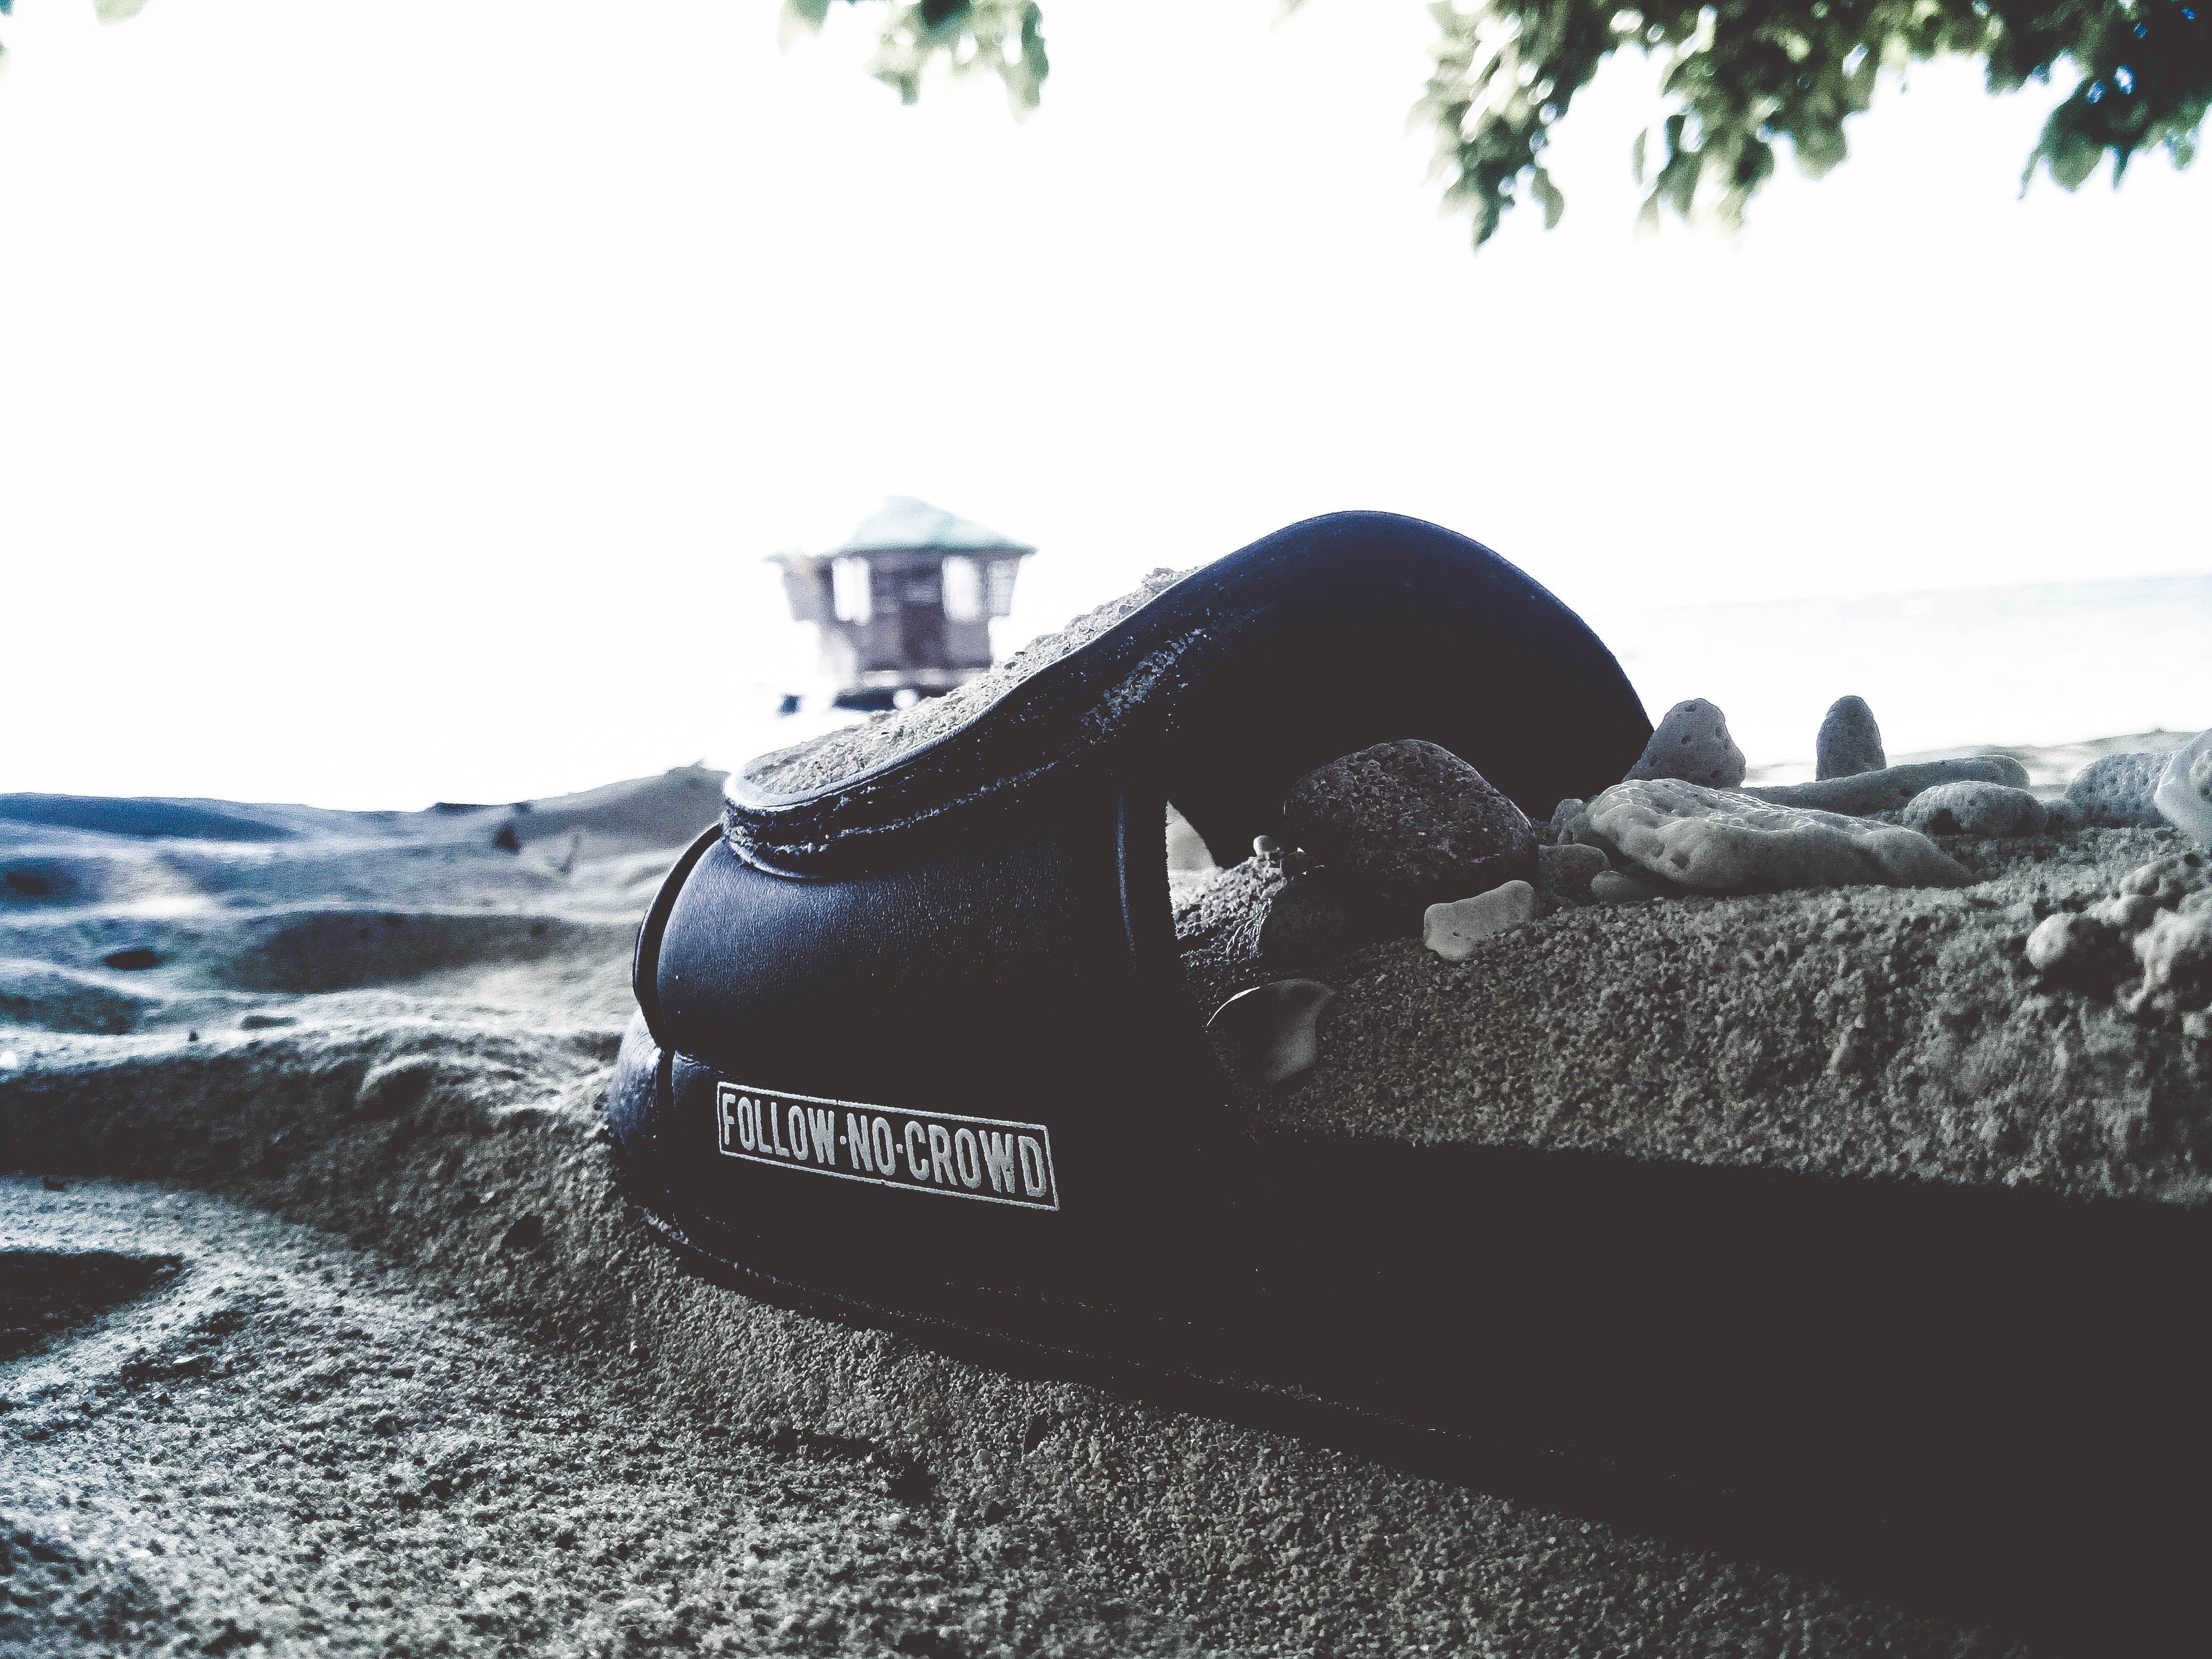 Black Textile on Gray Sand